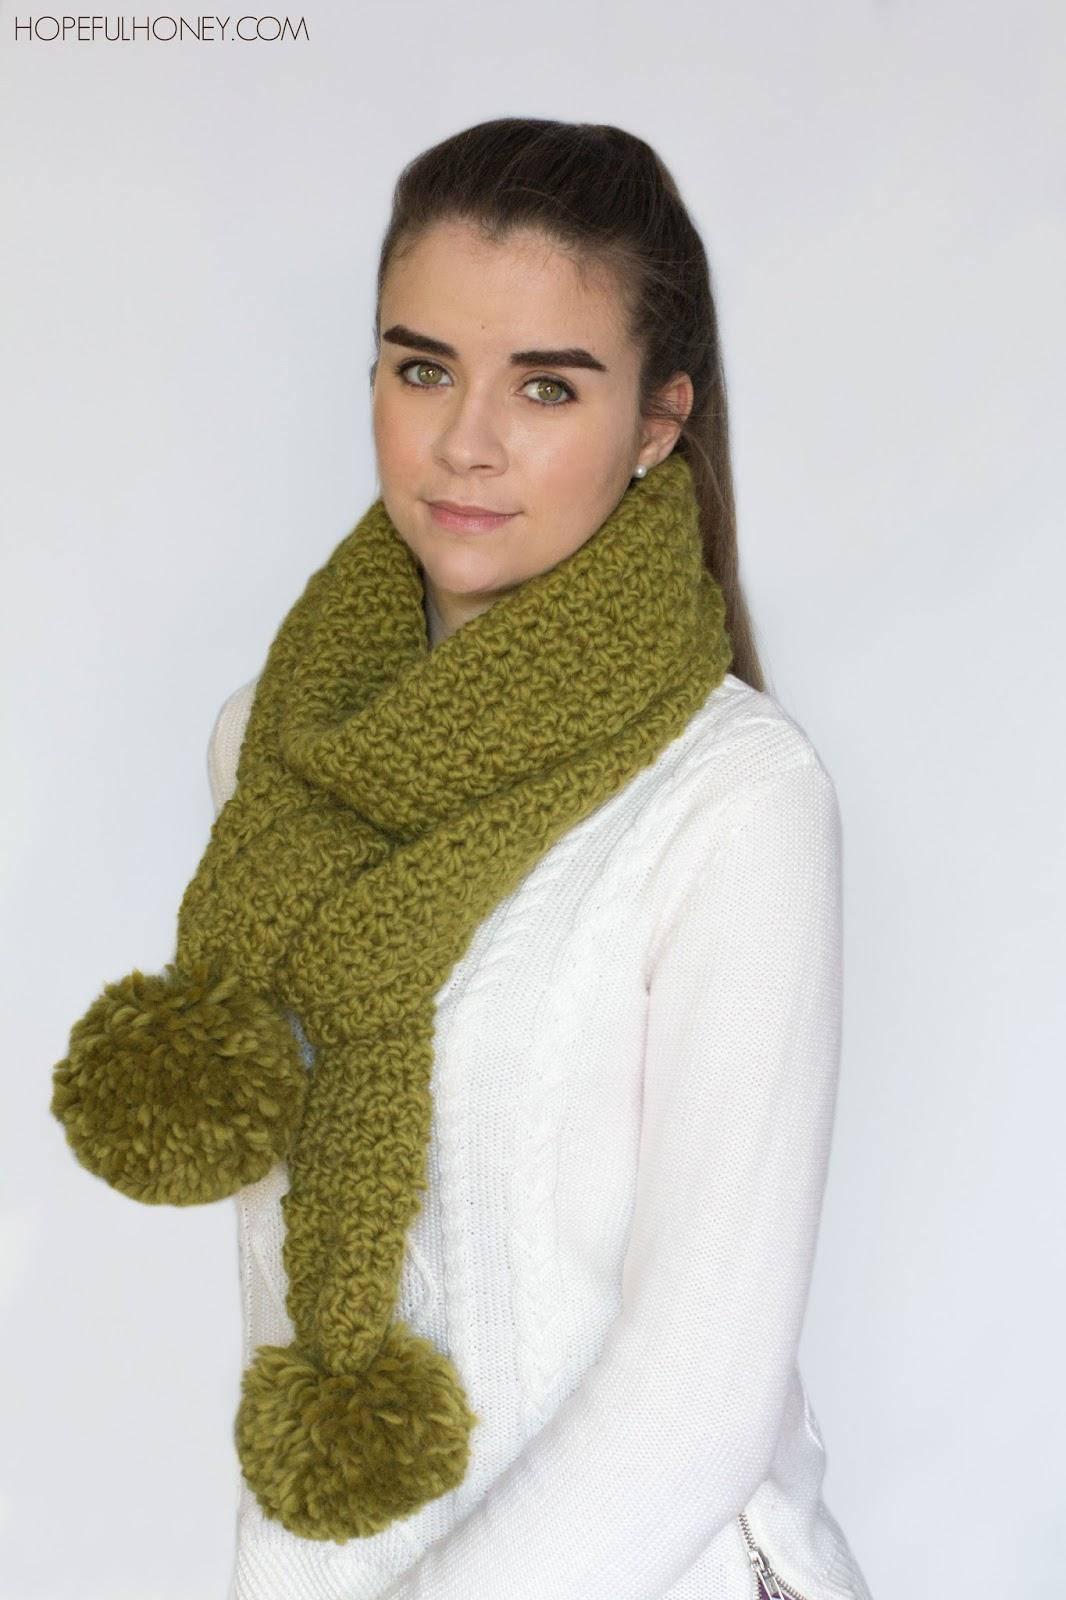 Hopeful Honey Craft, Crochet, Create: Chunky Cottontail ...